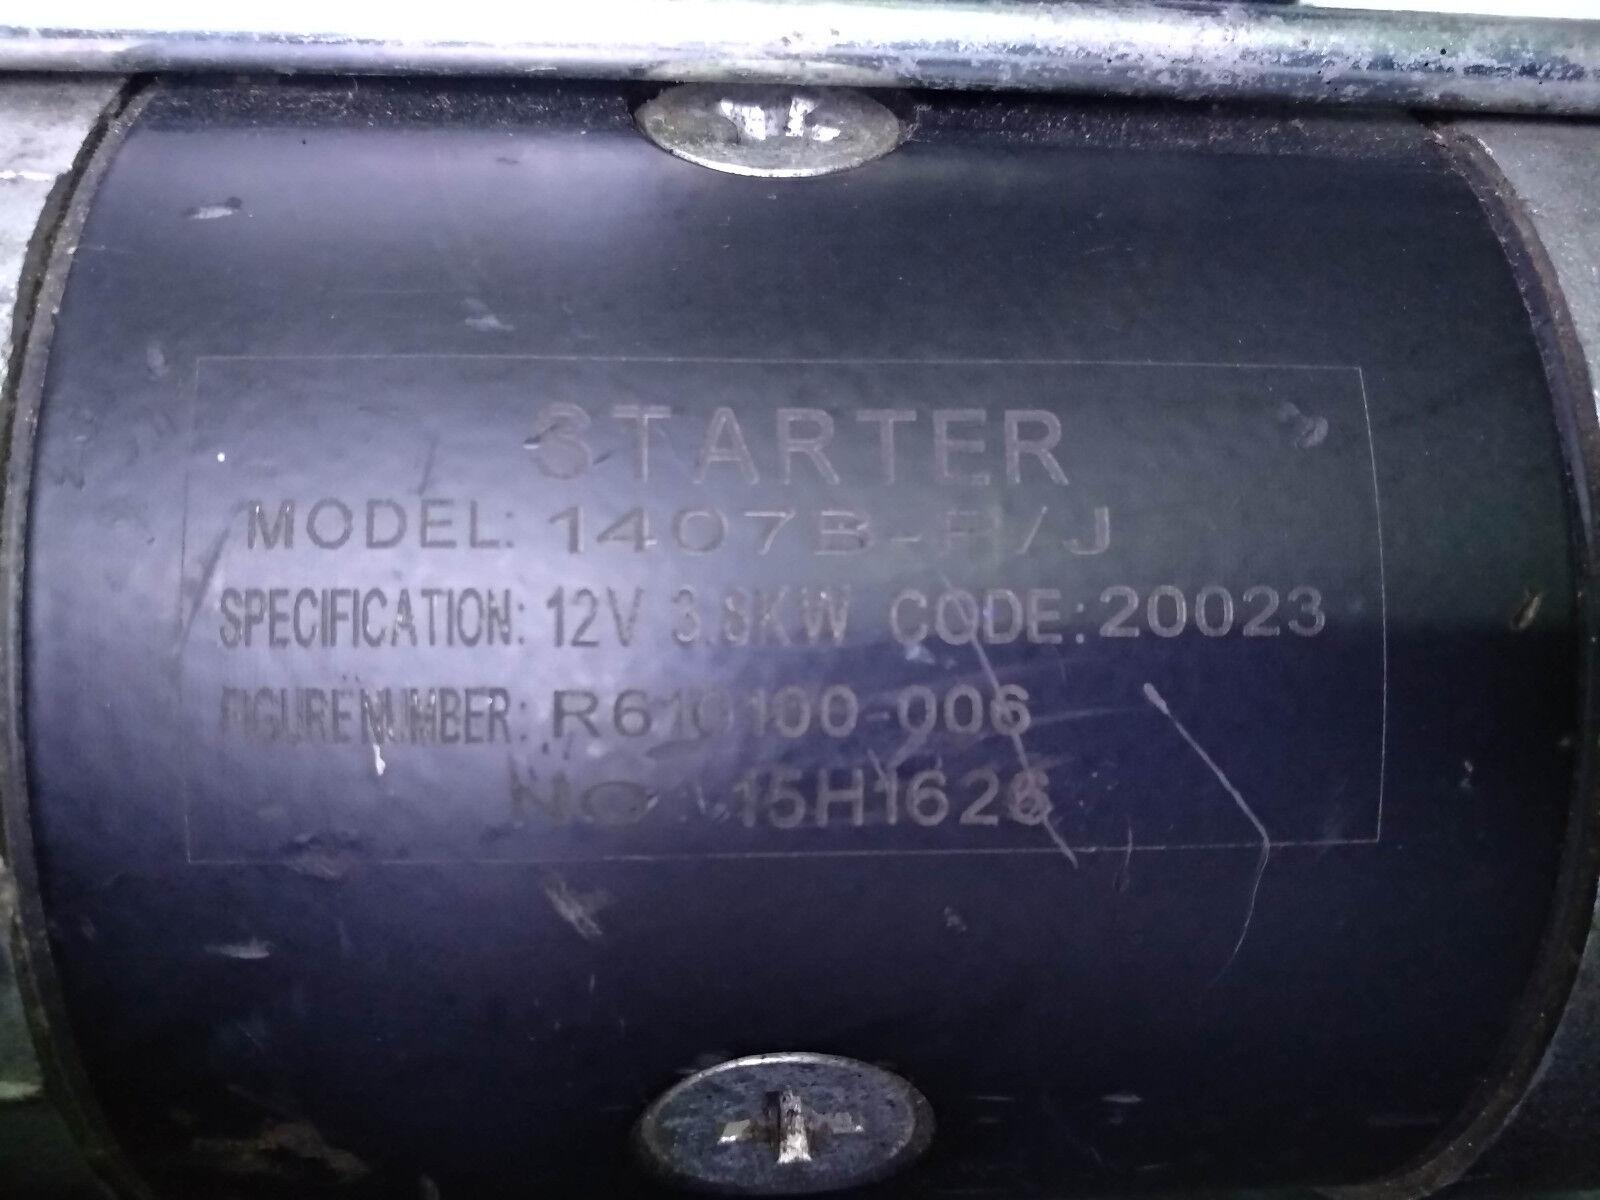 Engine starter Model: 1407B-P/J